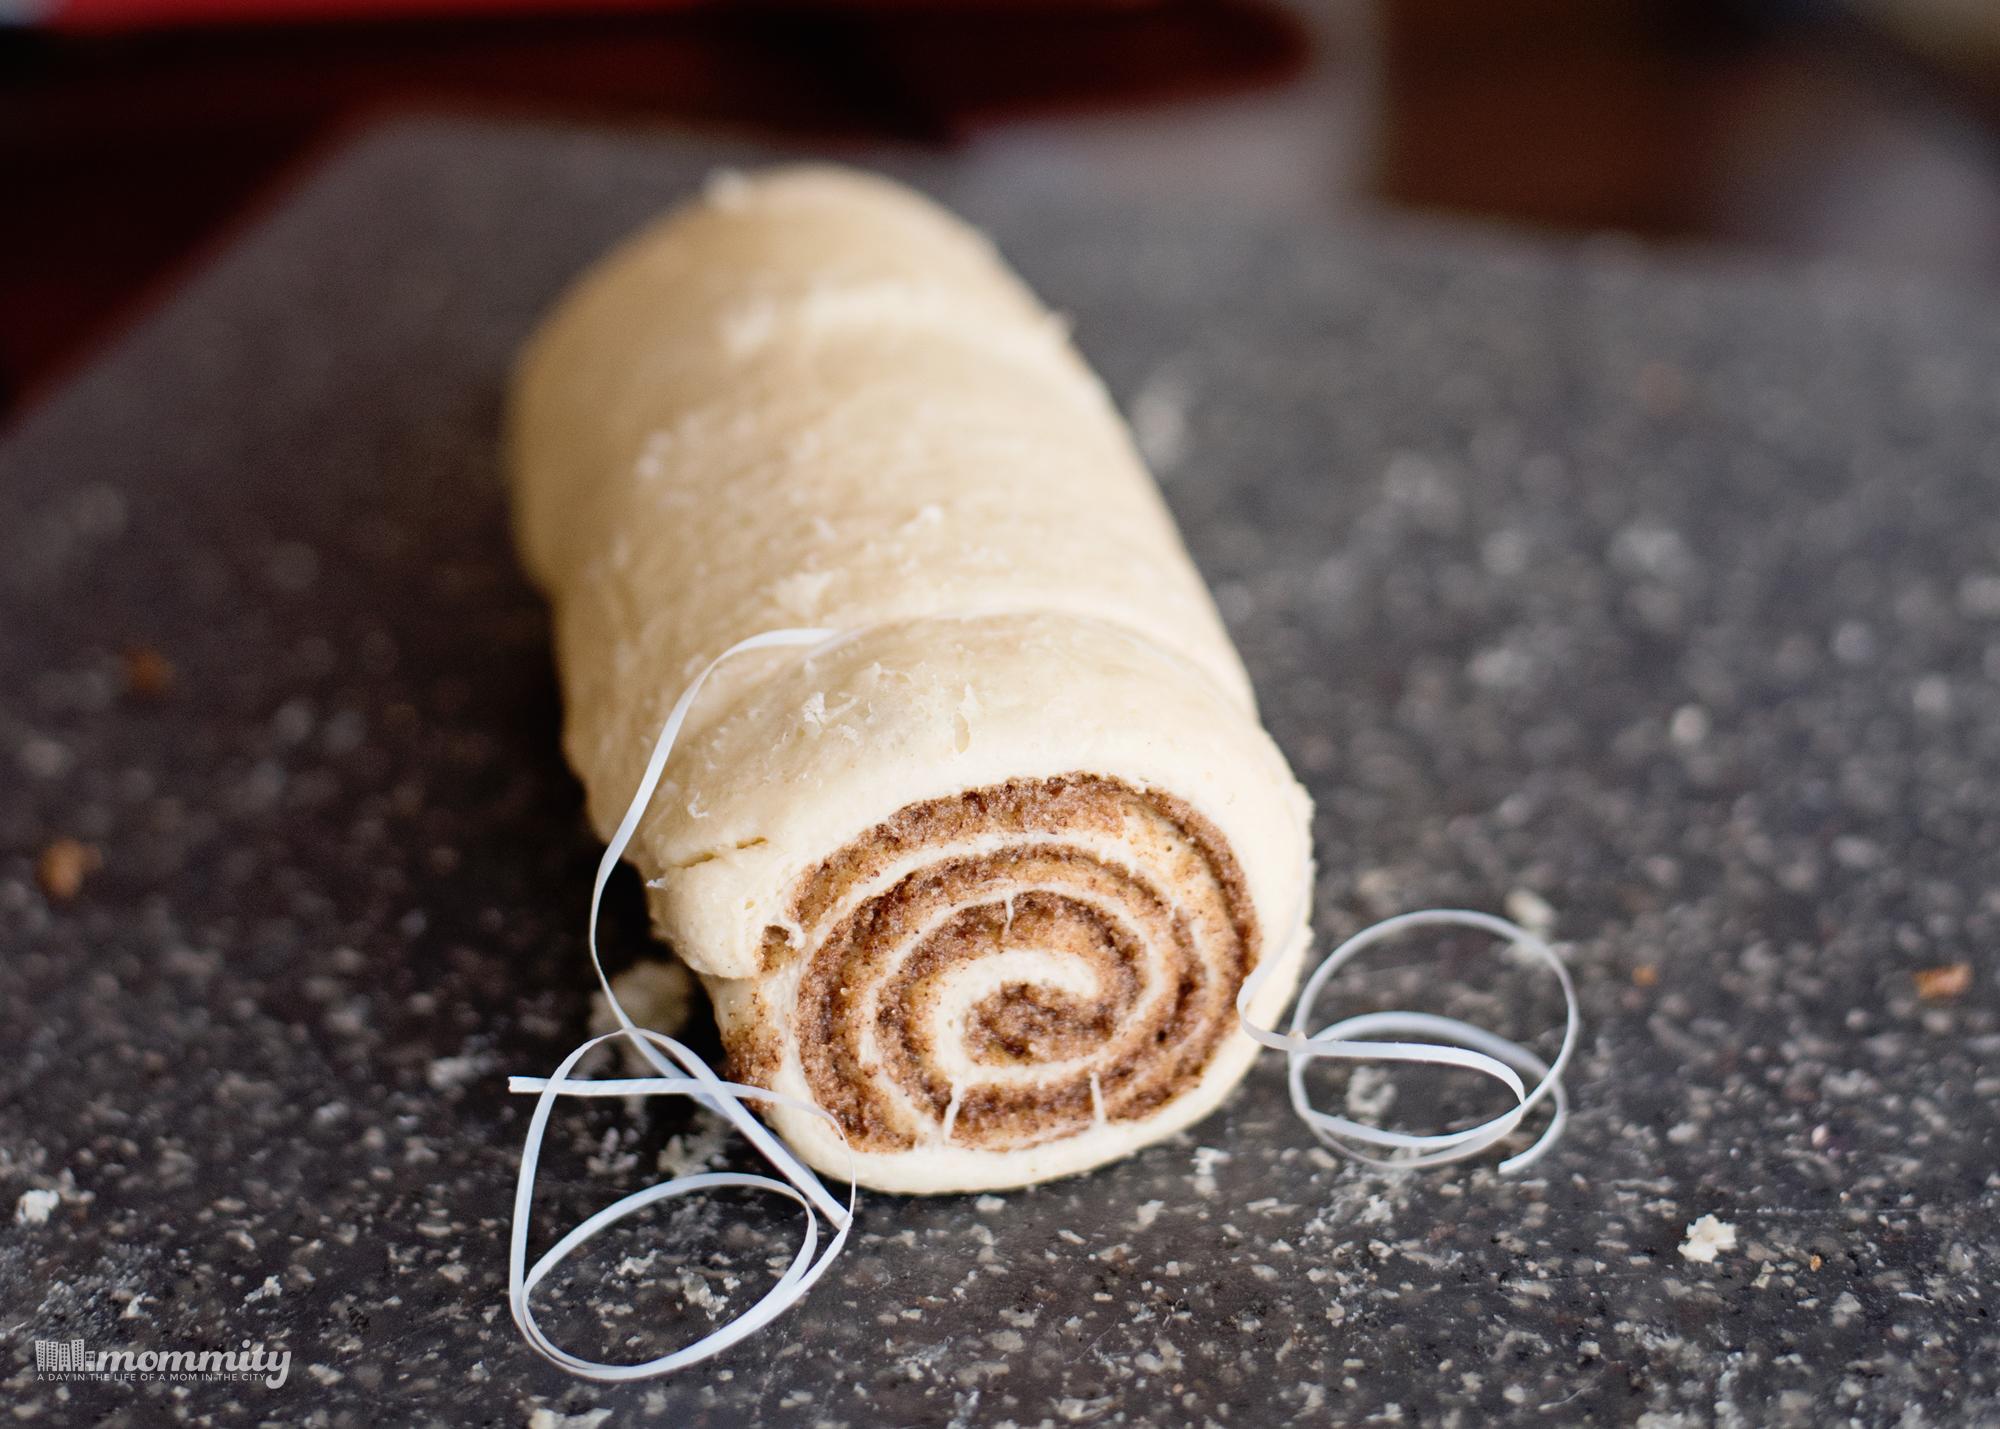 Crescent Roll Cinnamon Rolls - Caramel Pecan Cinnamon Rolls